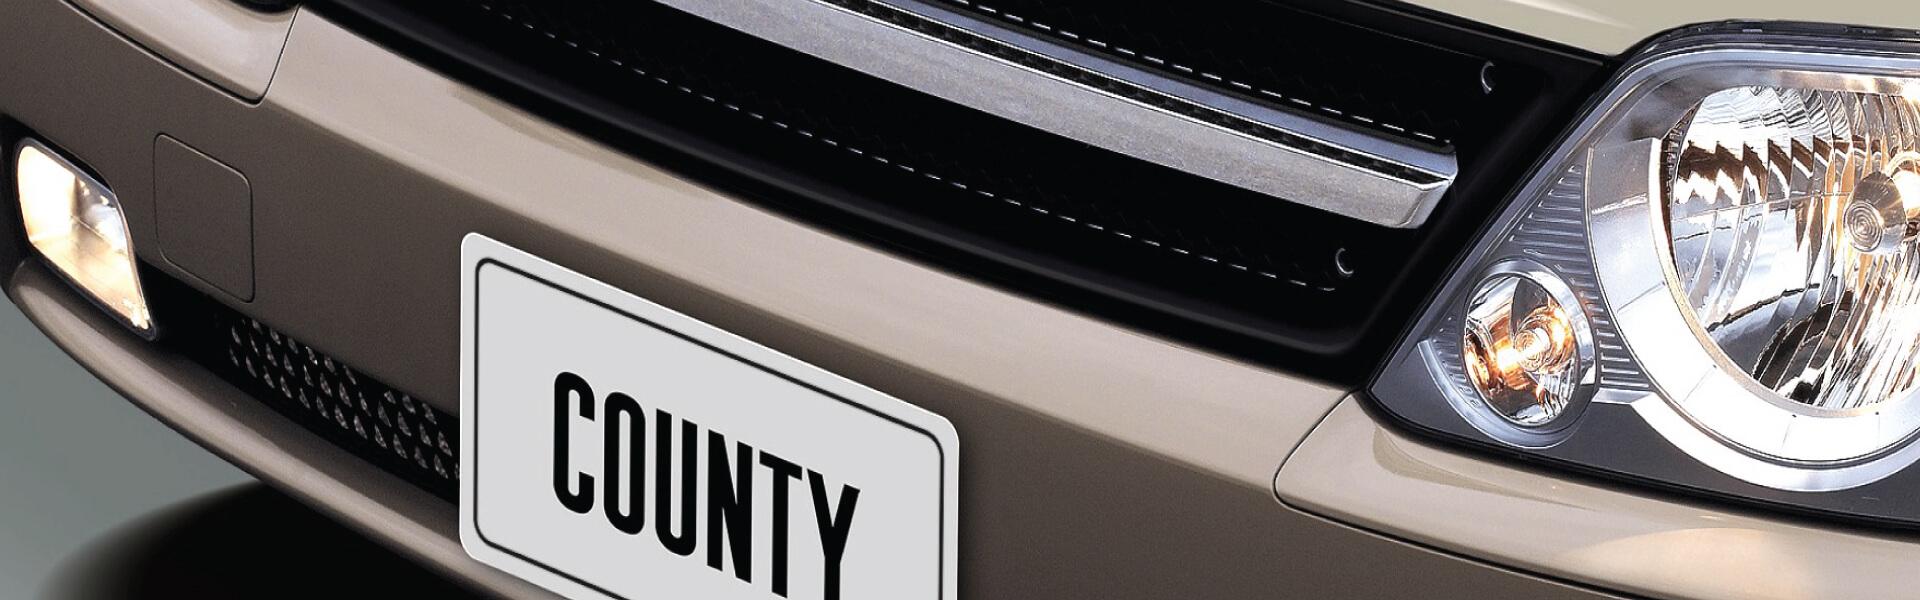 hyuc-county-2-puertas-exterior-header-1